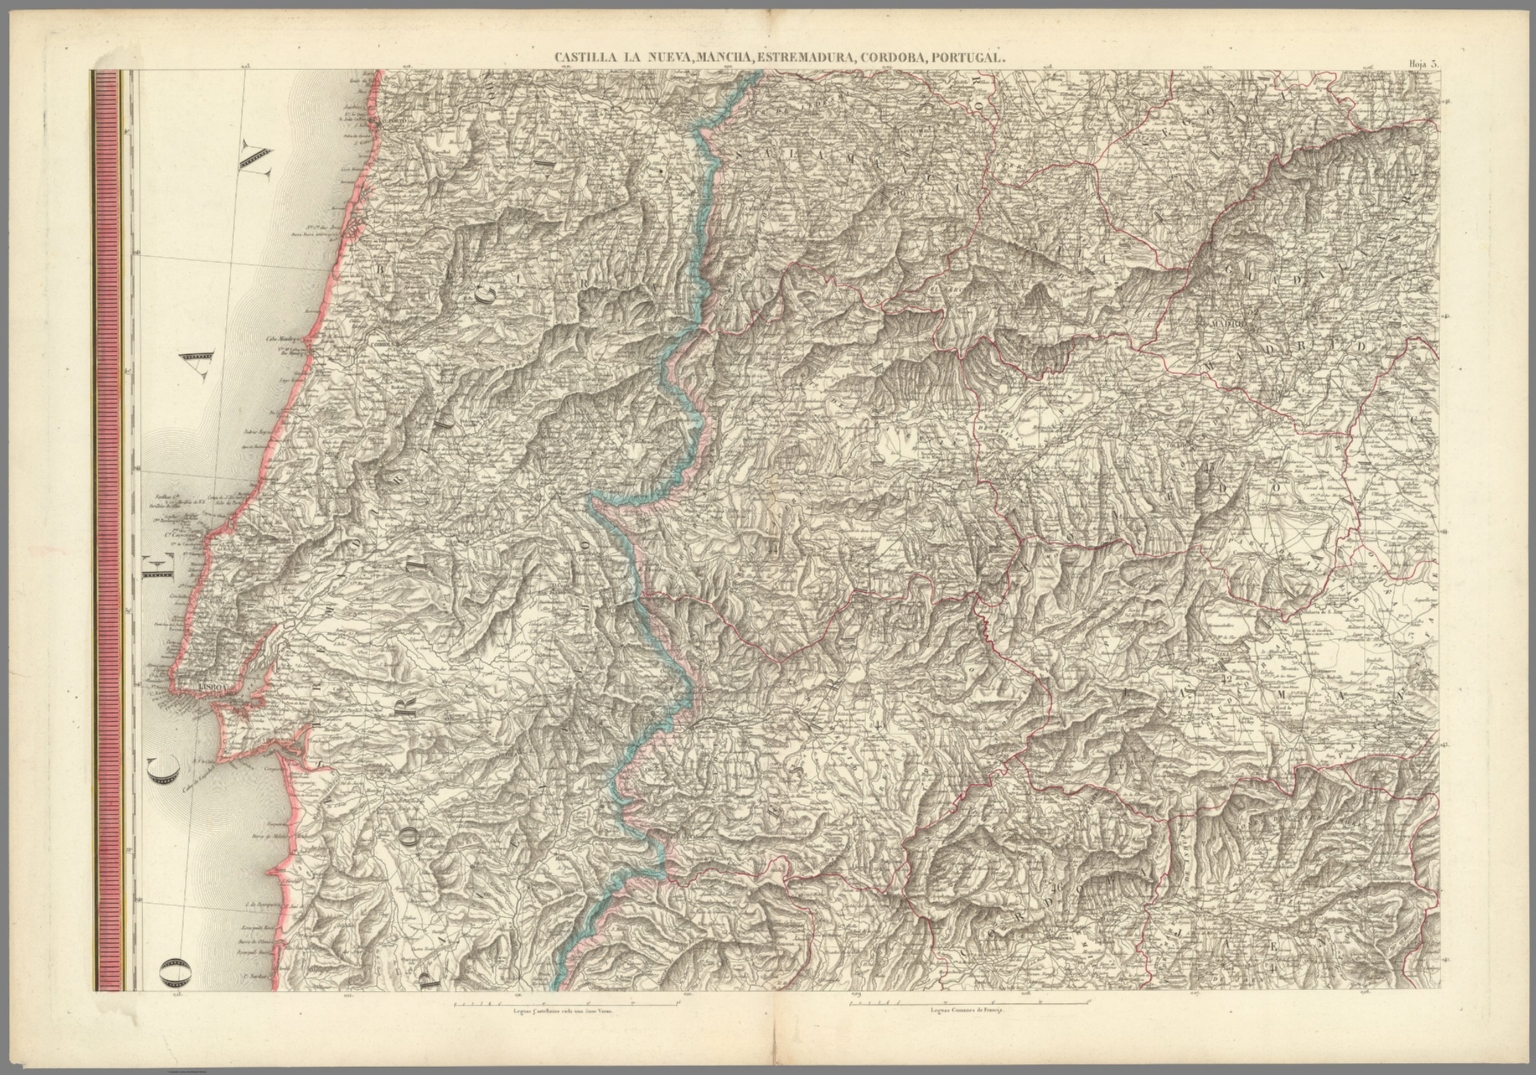 Hoja 3.Castilla la Nueva, Mancha, Estremadura, Cordoba, Portigal